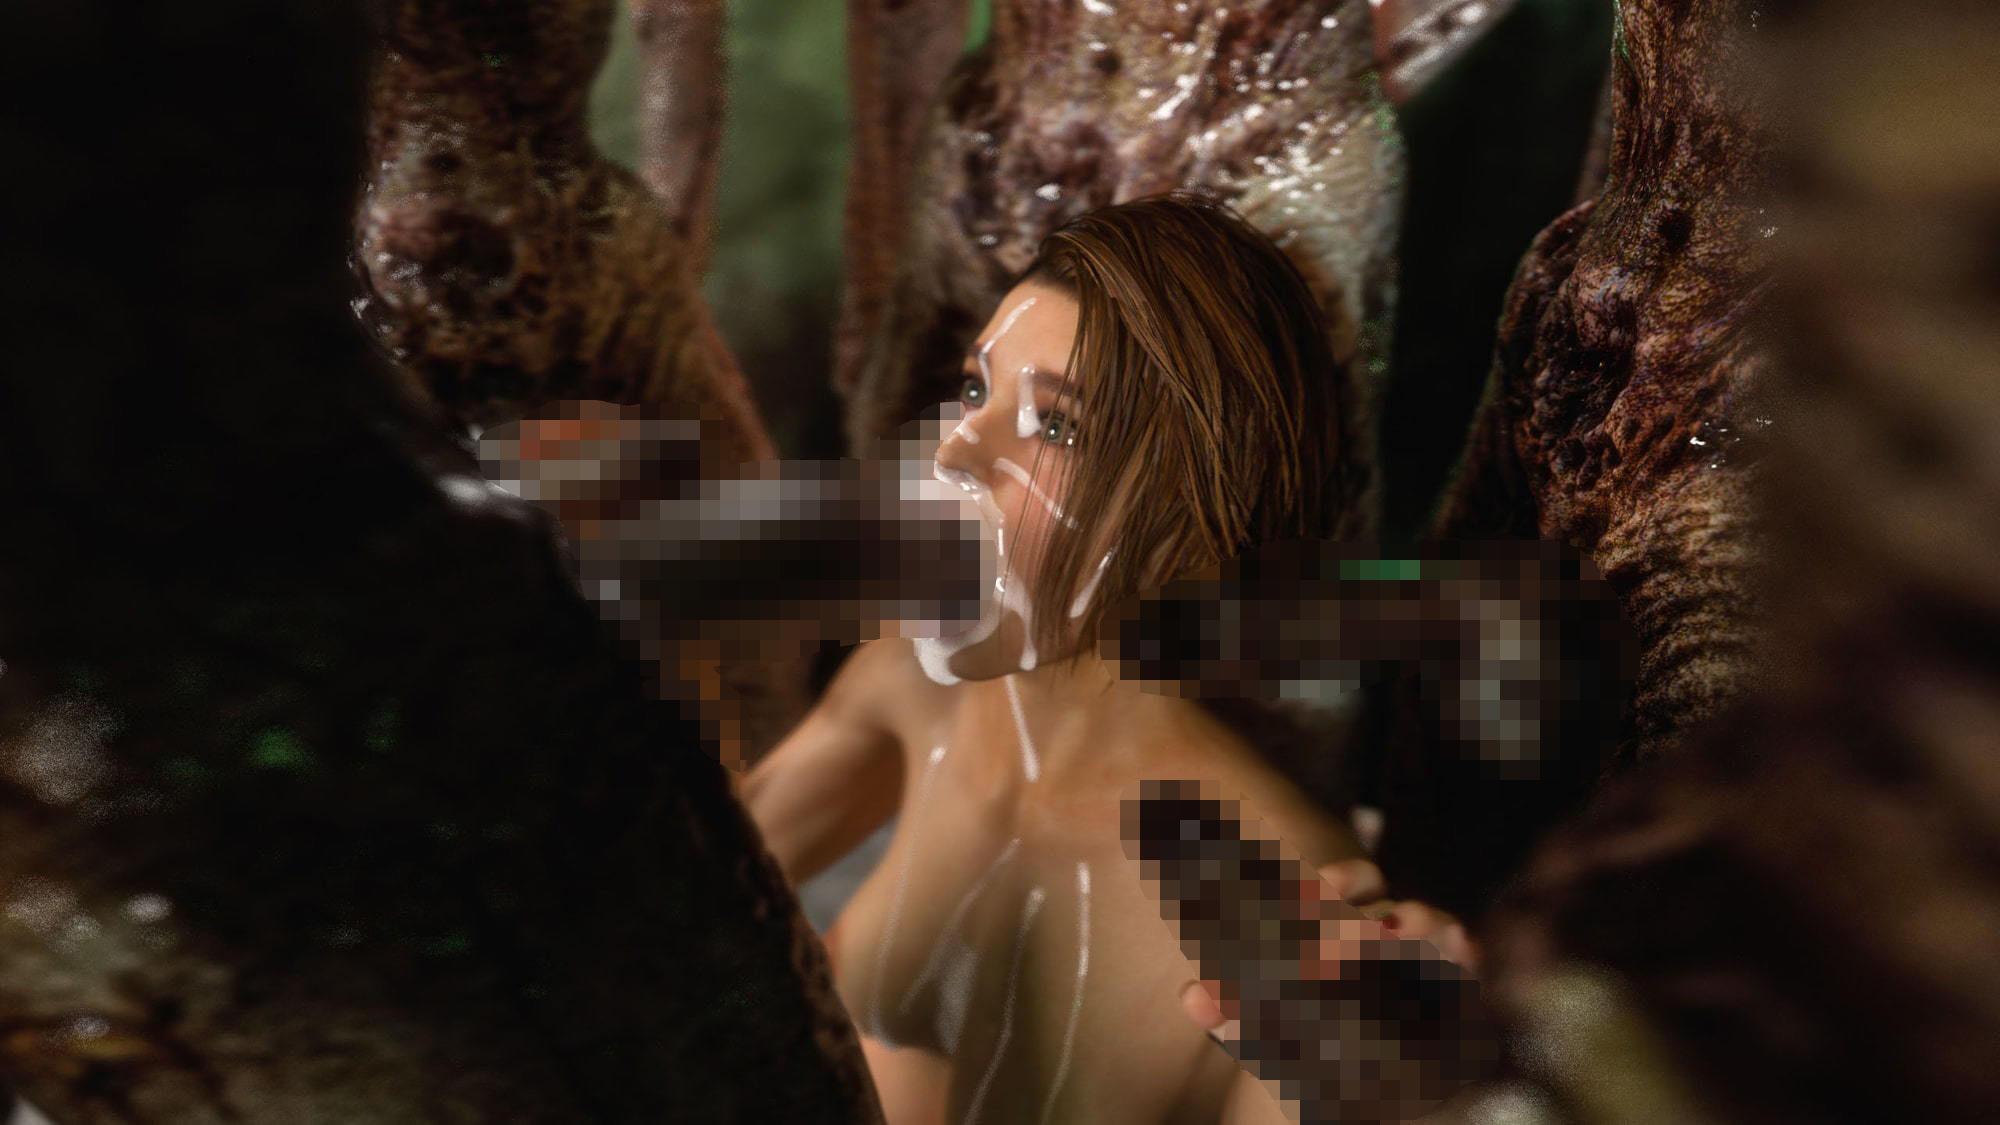 Residential Evil XXX (part 5)